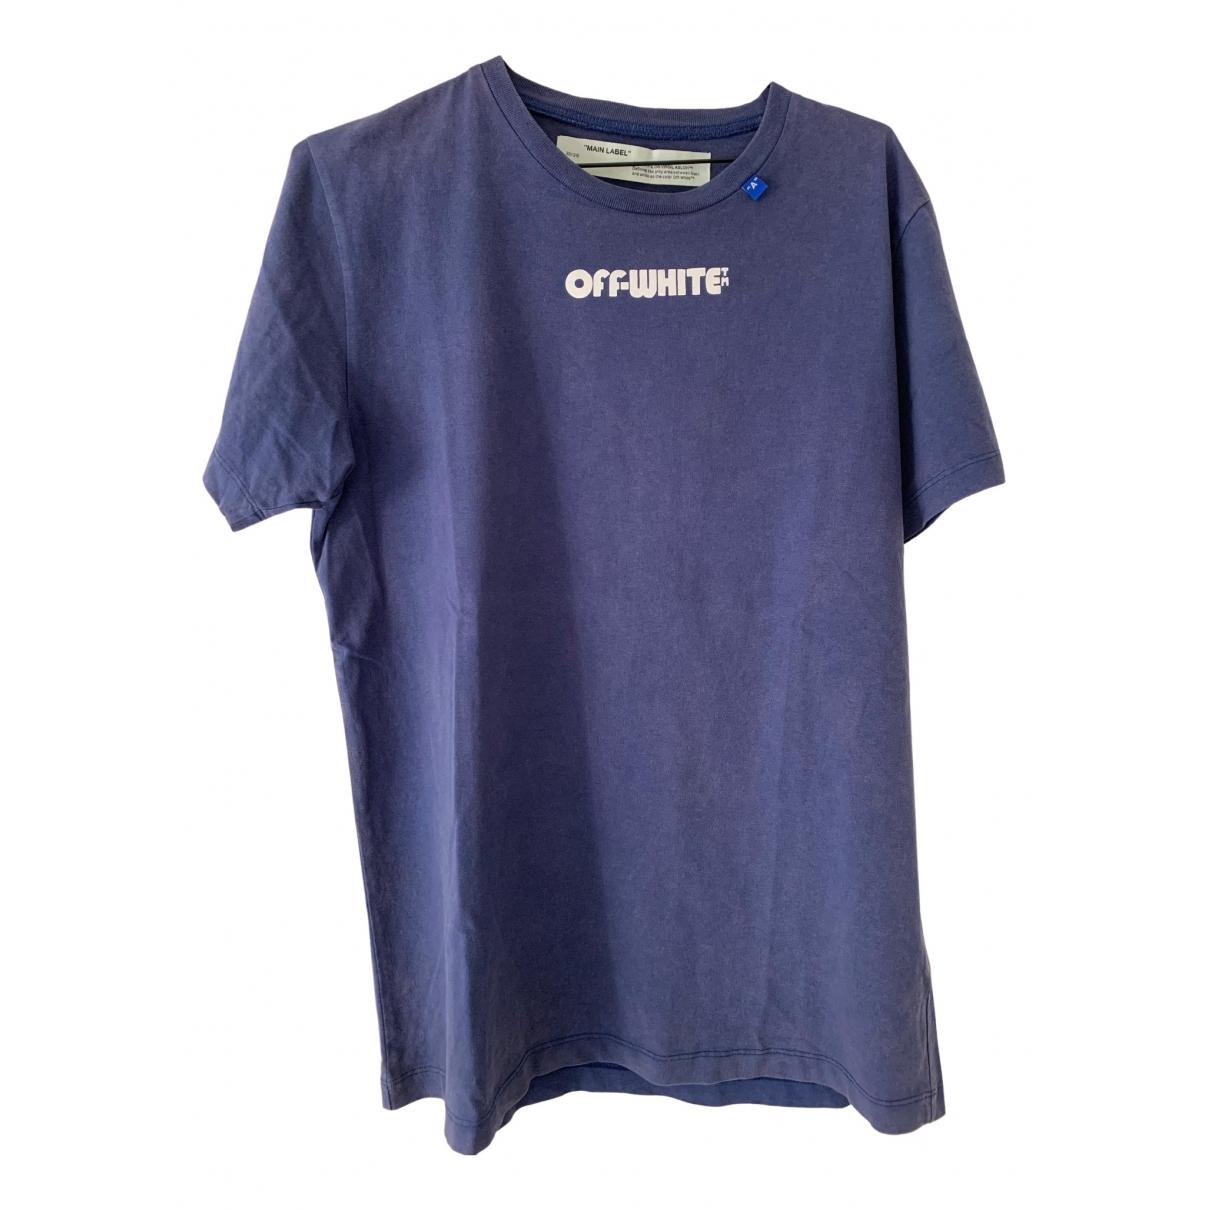 Off-white \N Blue Cotton T-shirts for Men M International